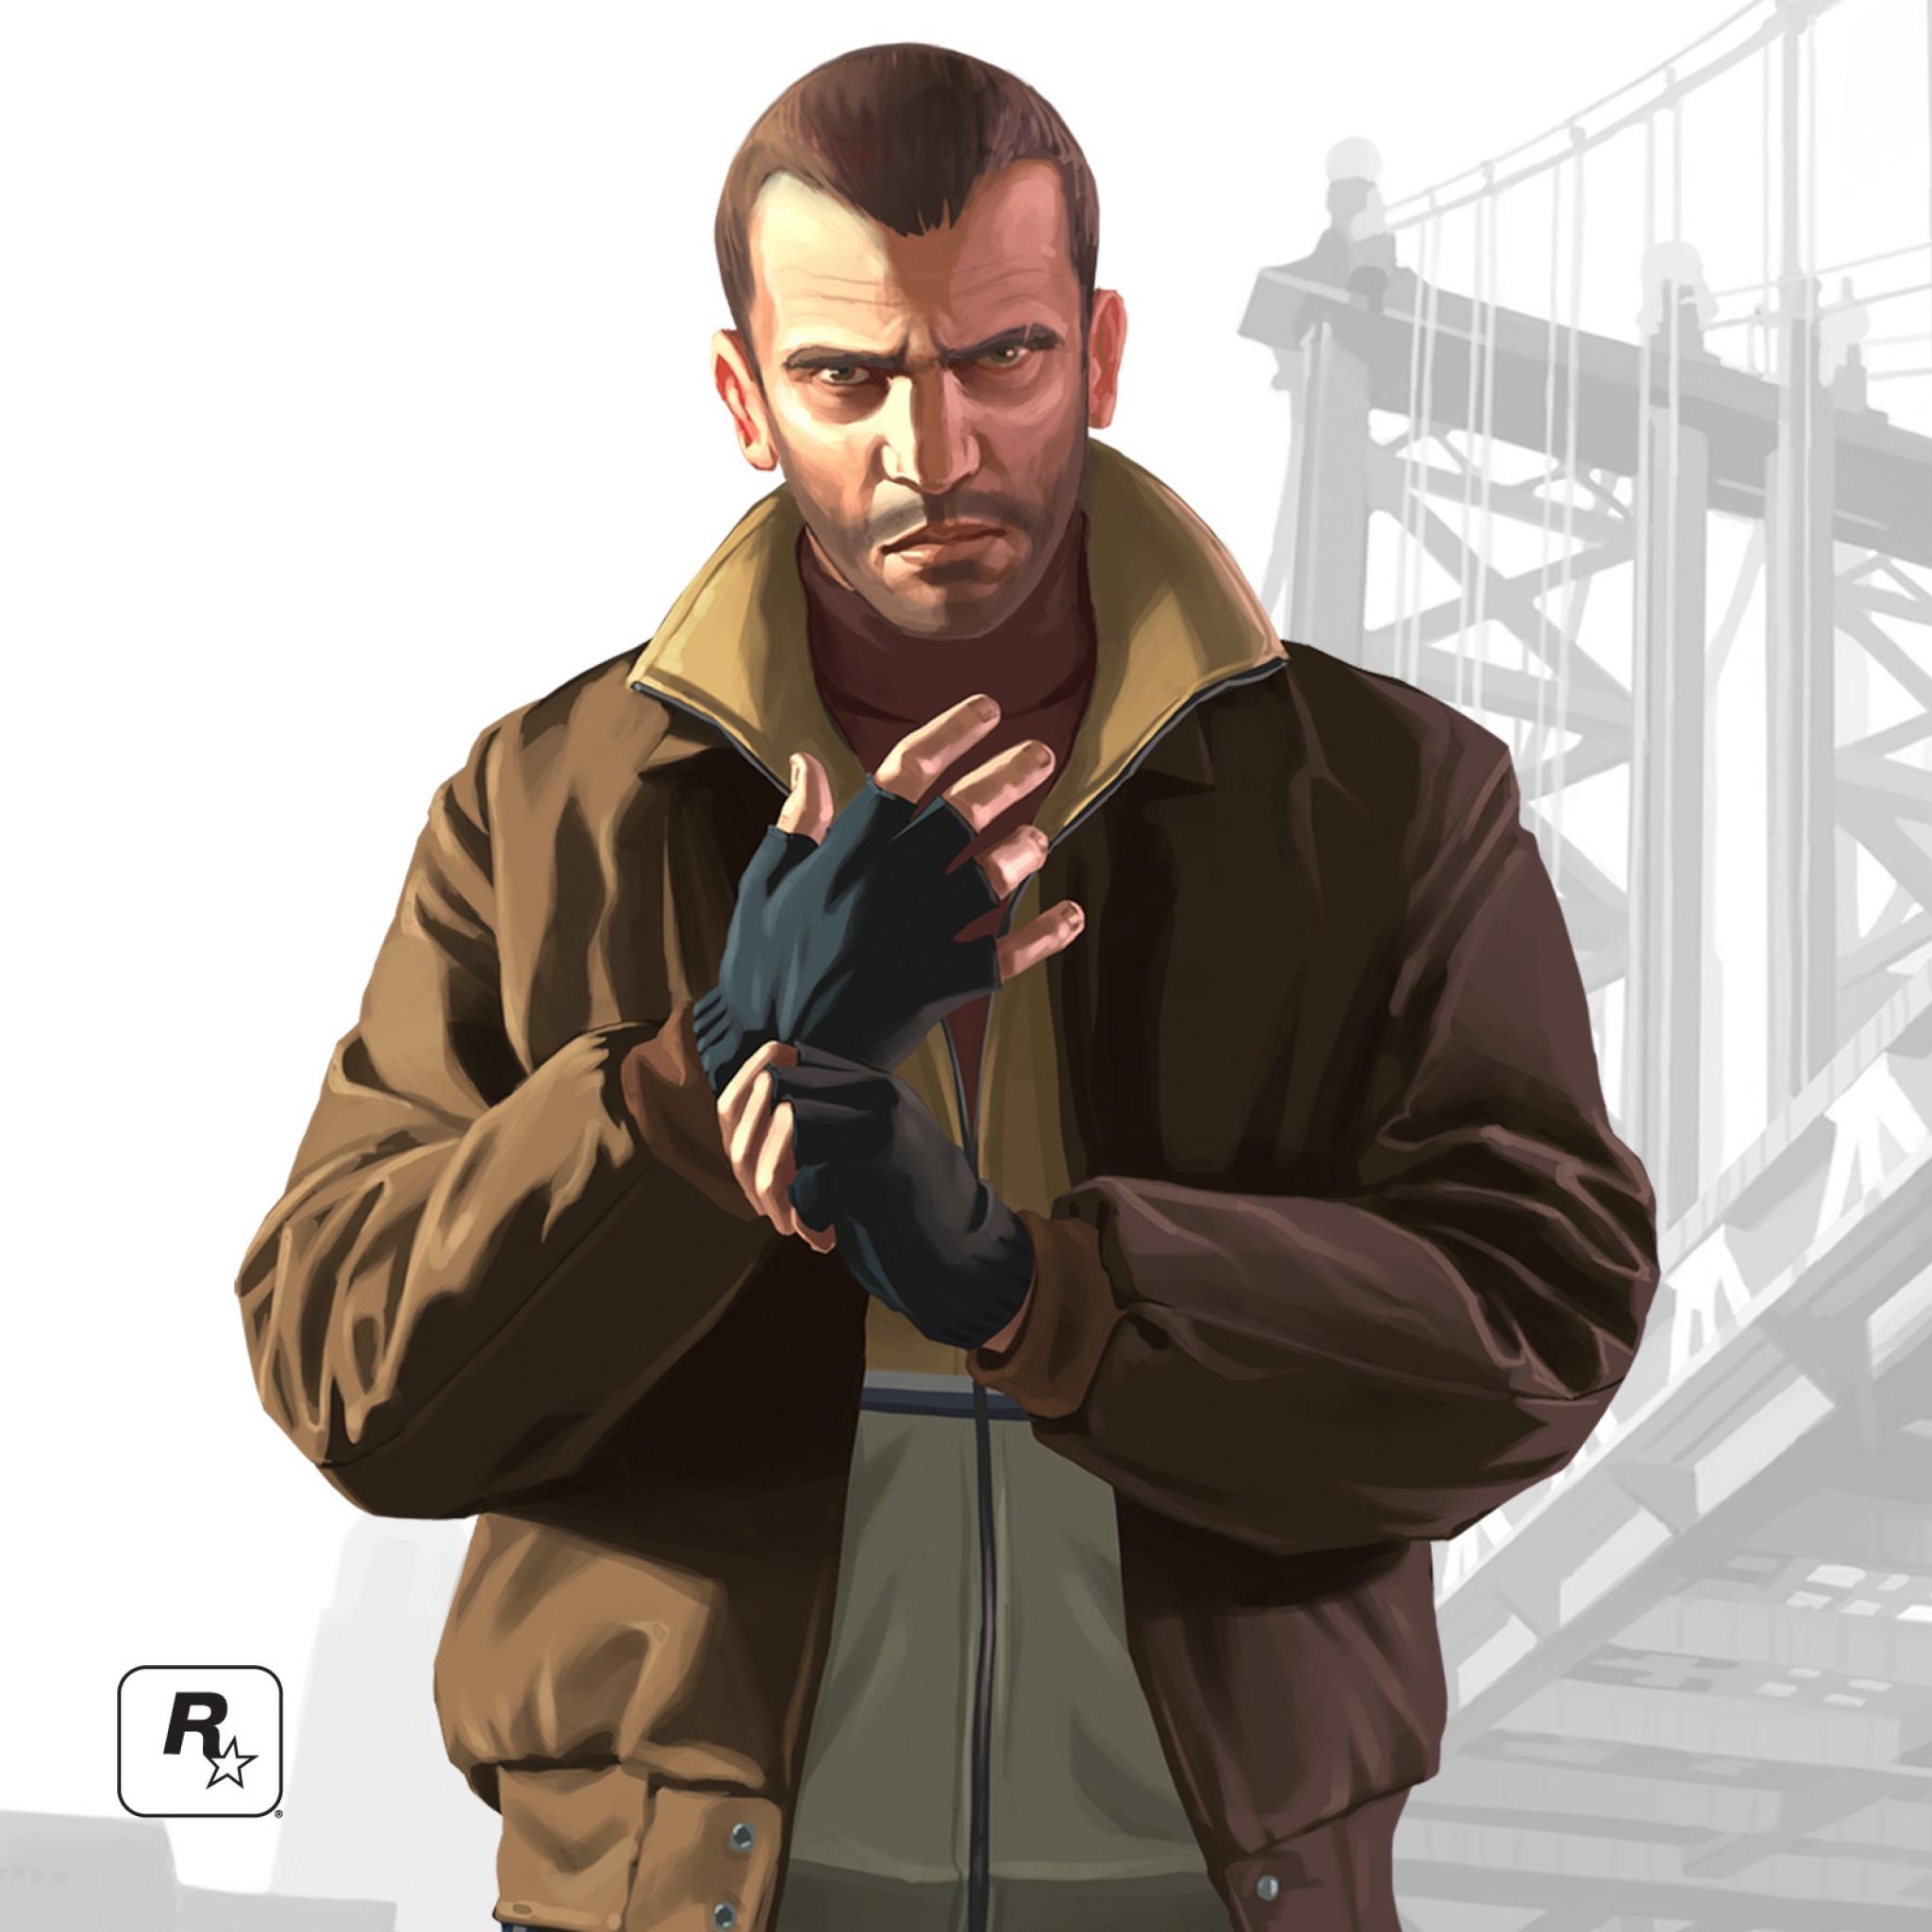 Image Result For Video Games Grand Theft Auto Niko Bellic Gta Iv Wallpaper